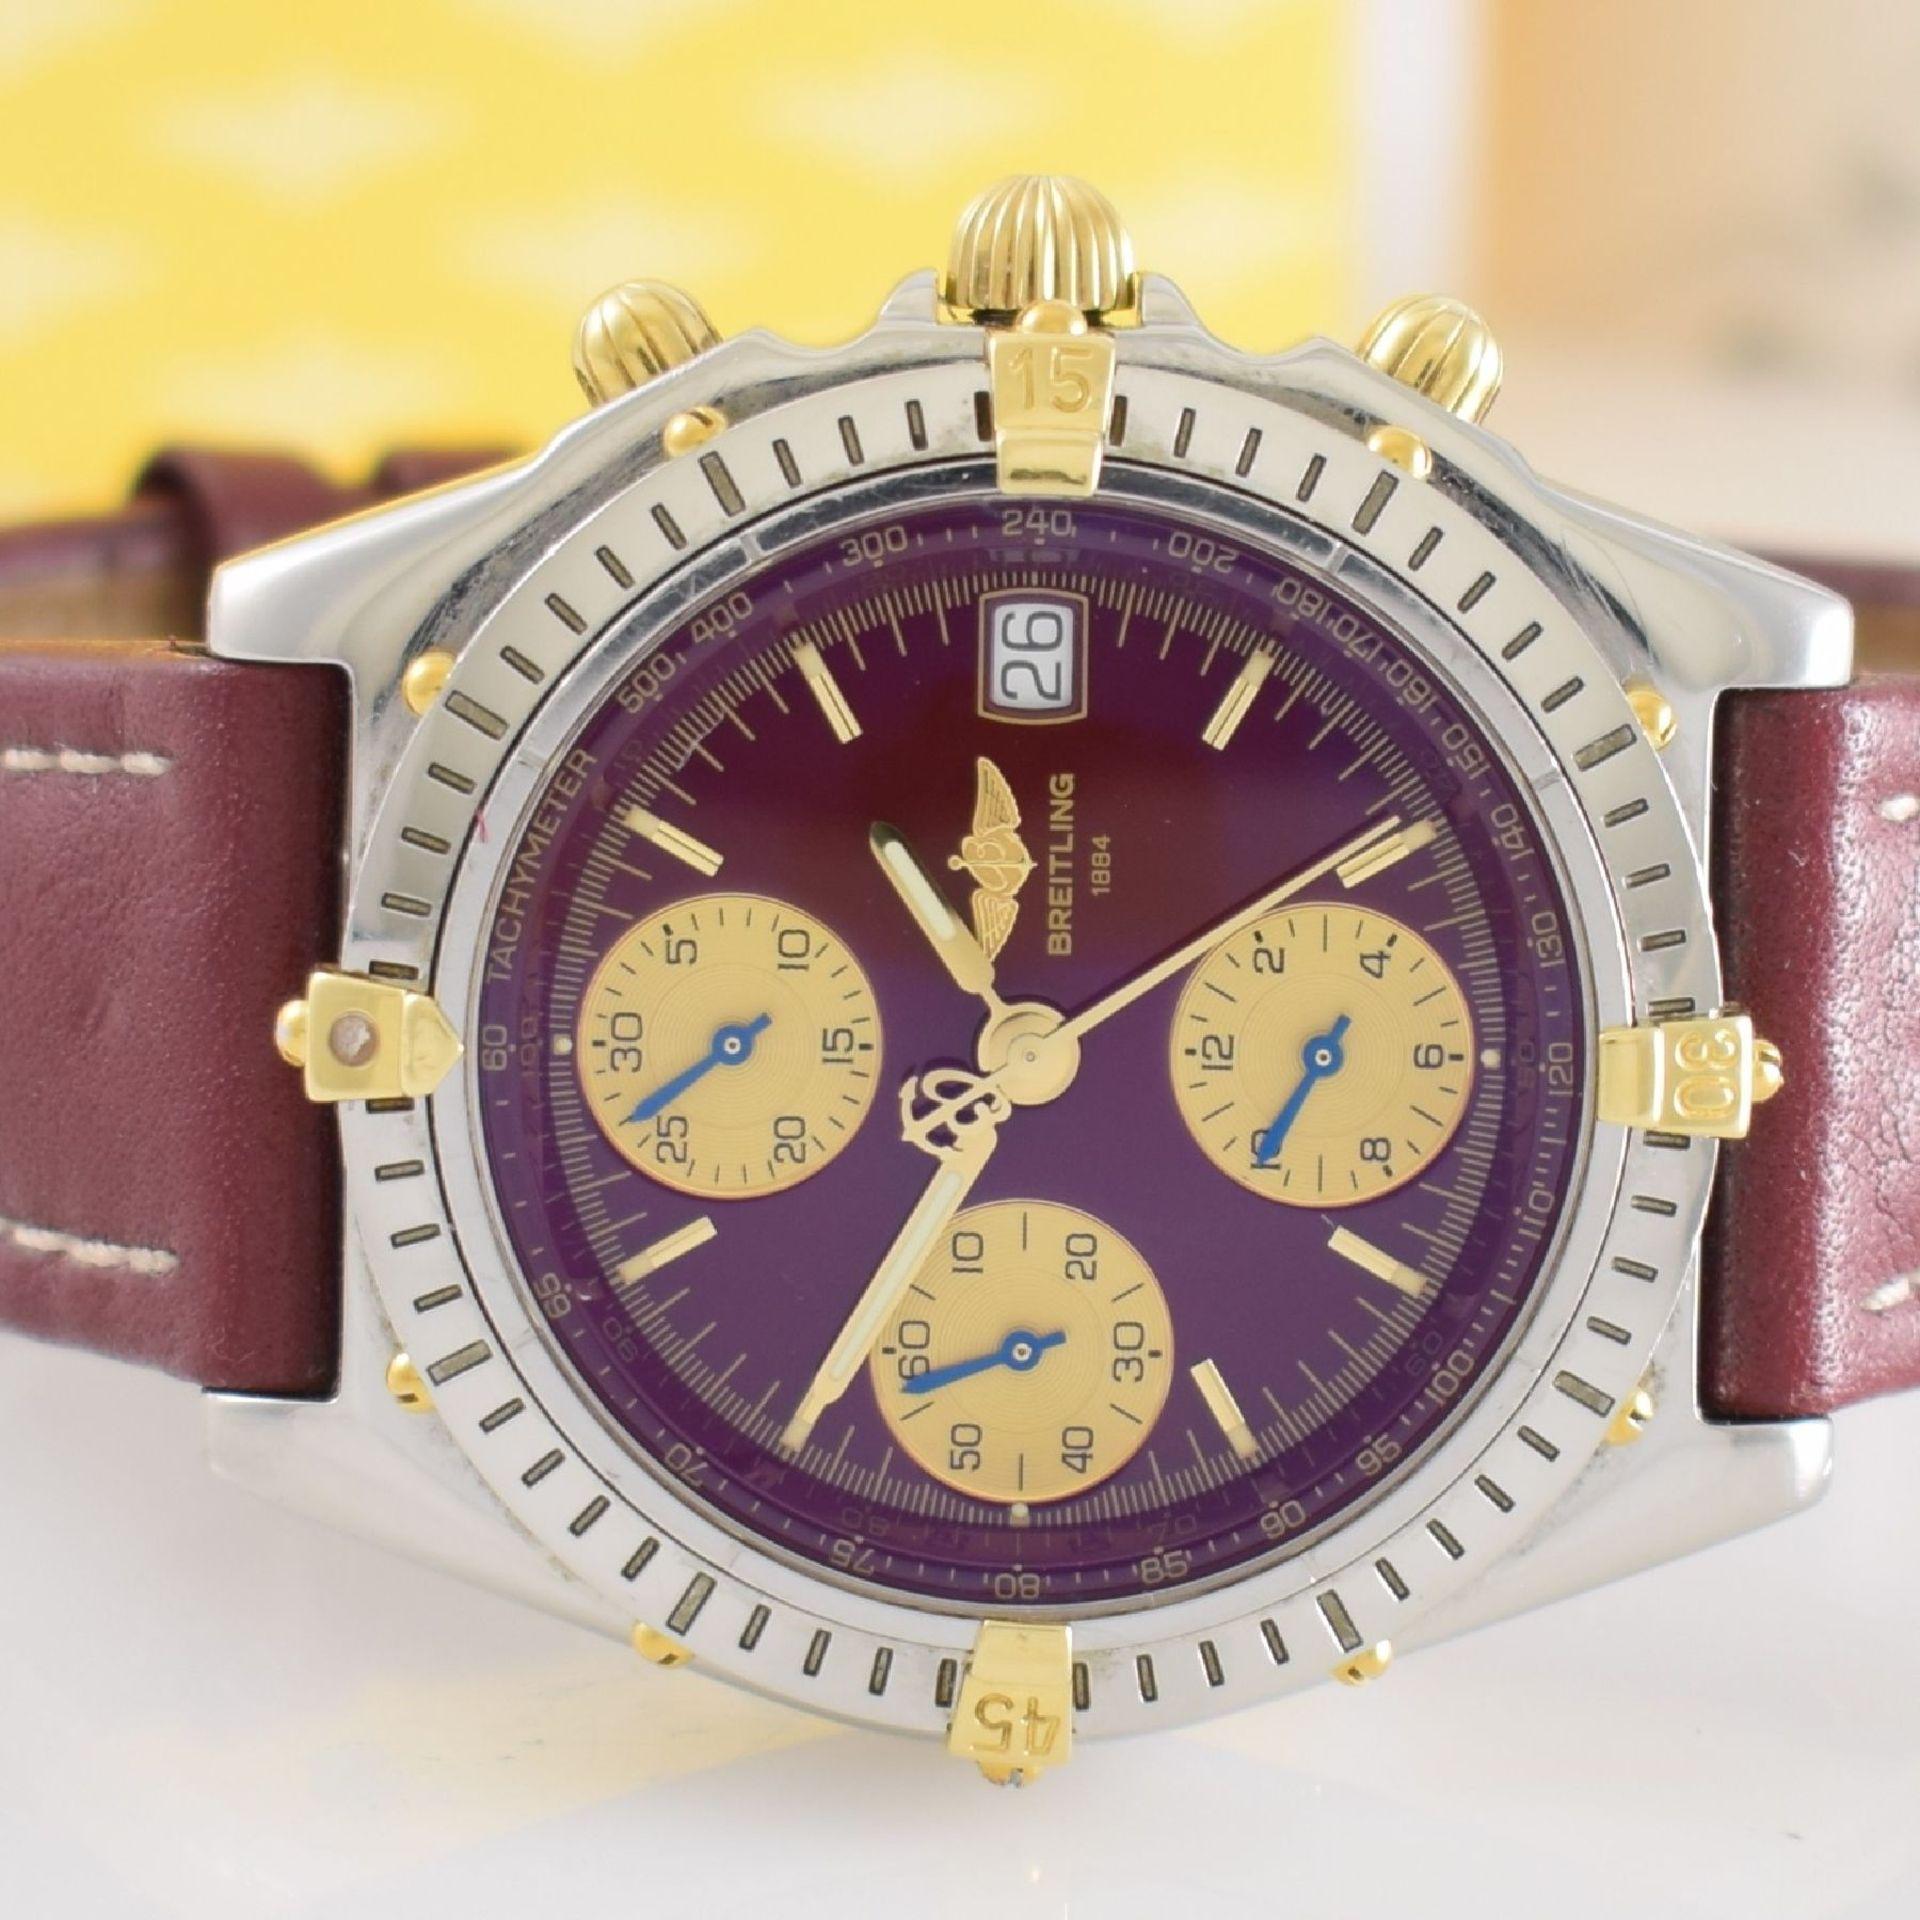 BREITLING Chronomat Herrenarmbanduhr mit Chronograph, Schweiz verk. lt. beil orig. Garantiekarte - Bild 3 aus 8